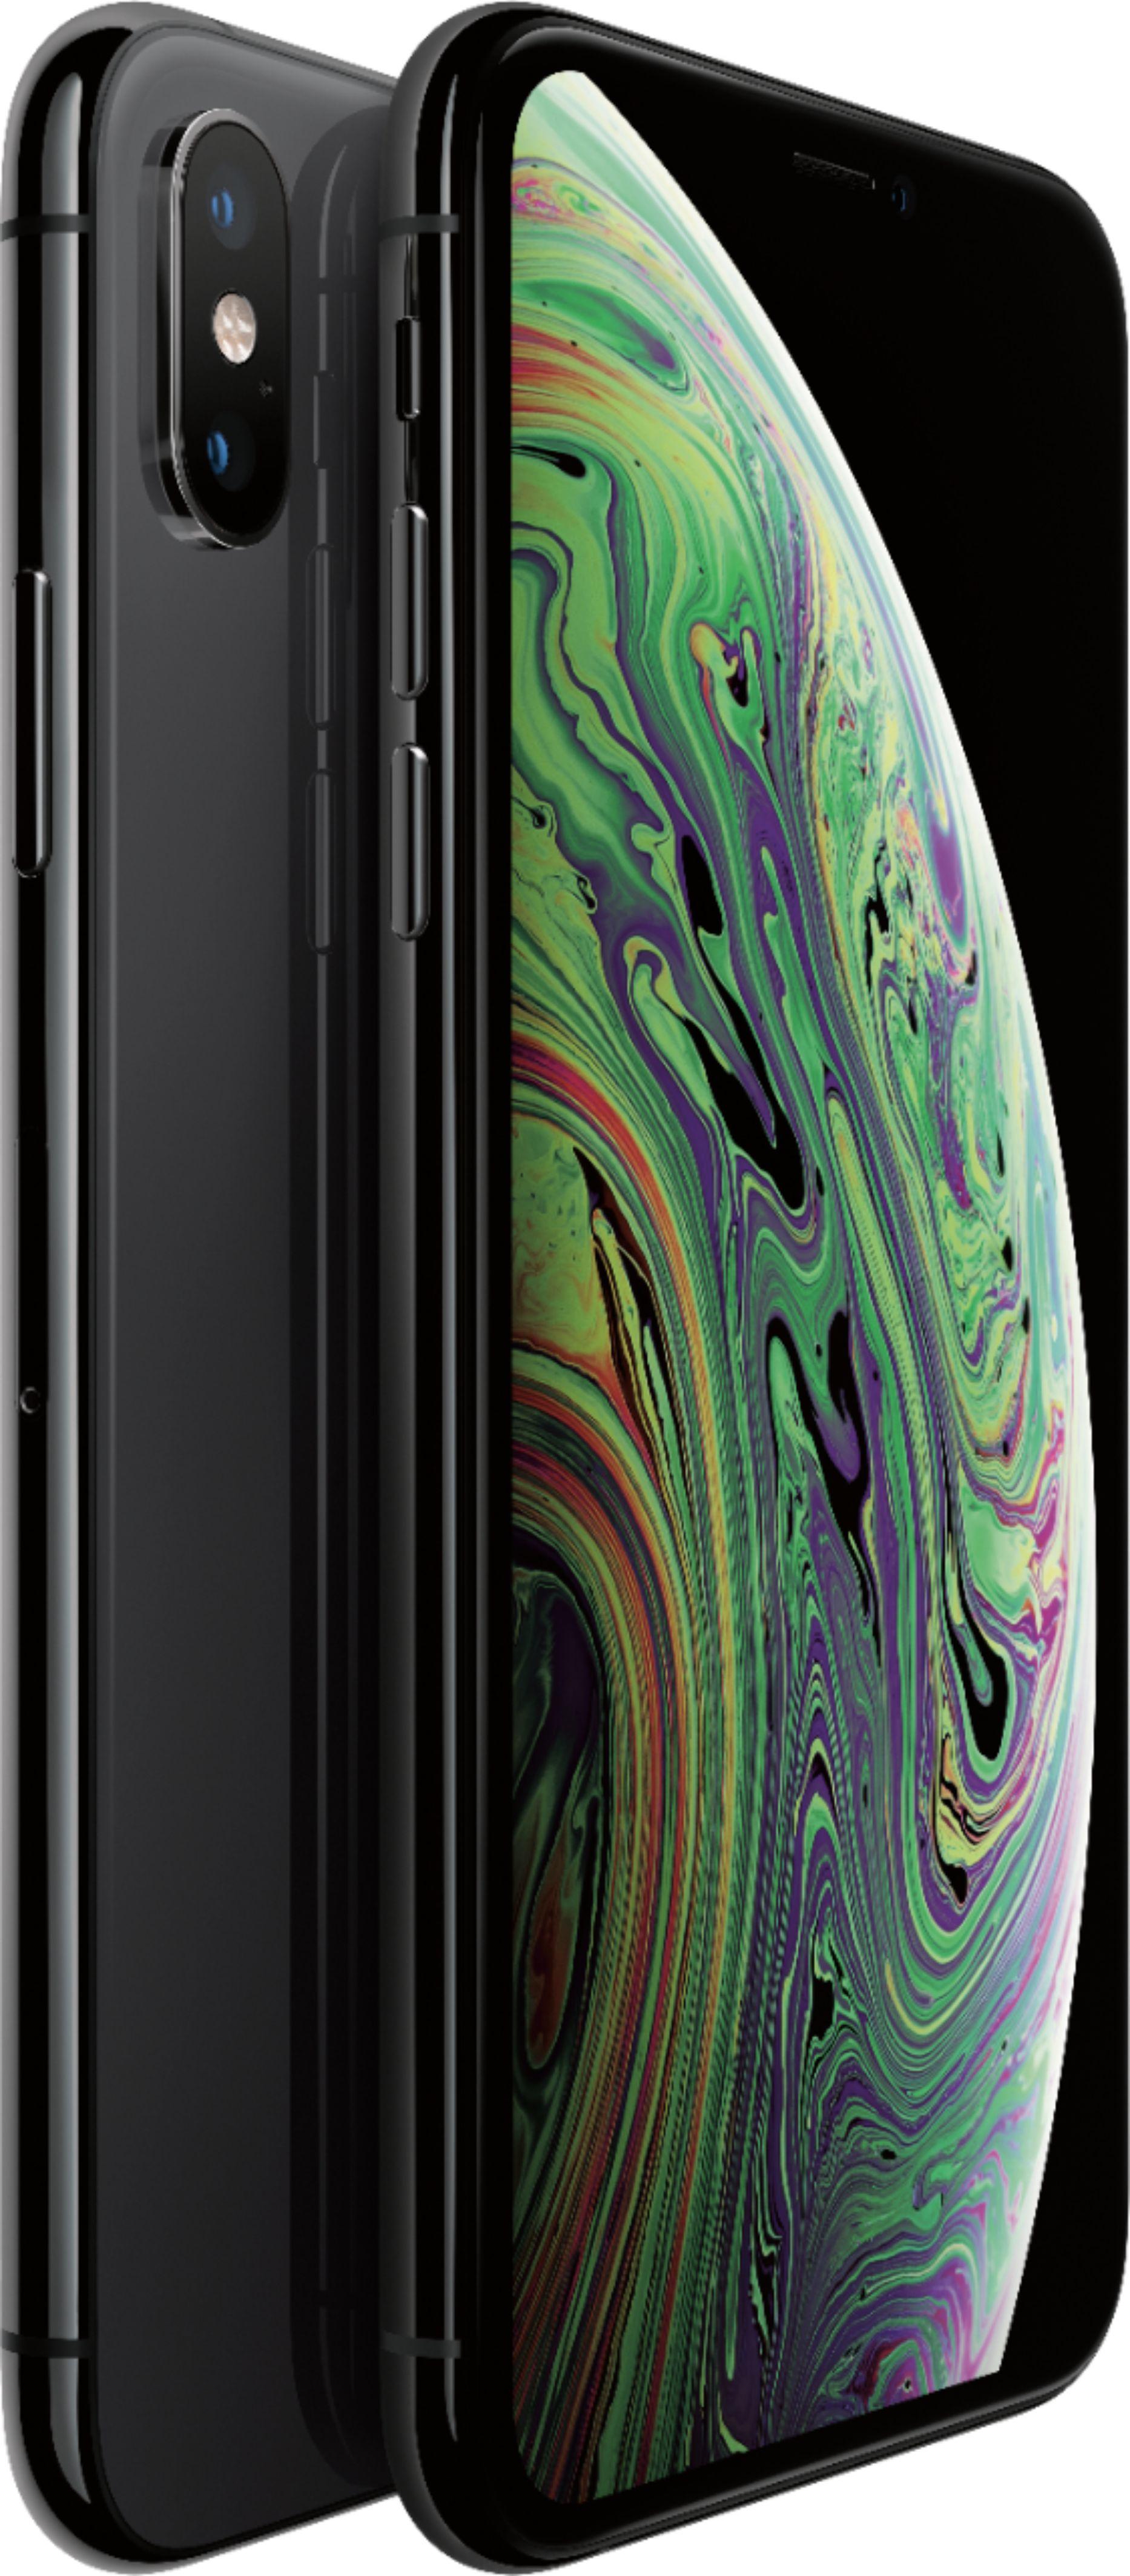 64GB Apple iPhone XS Unlocked Smartphone (Space Gray) $650 + Free S/H